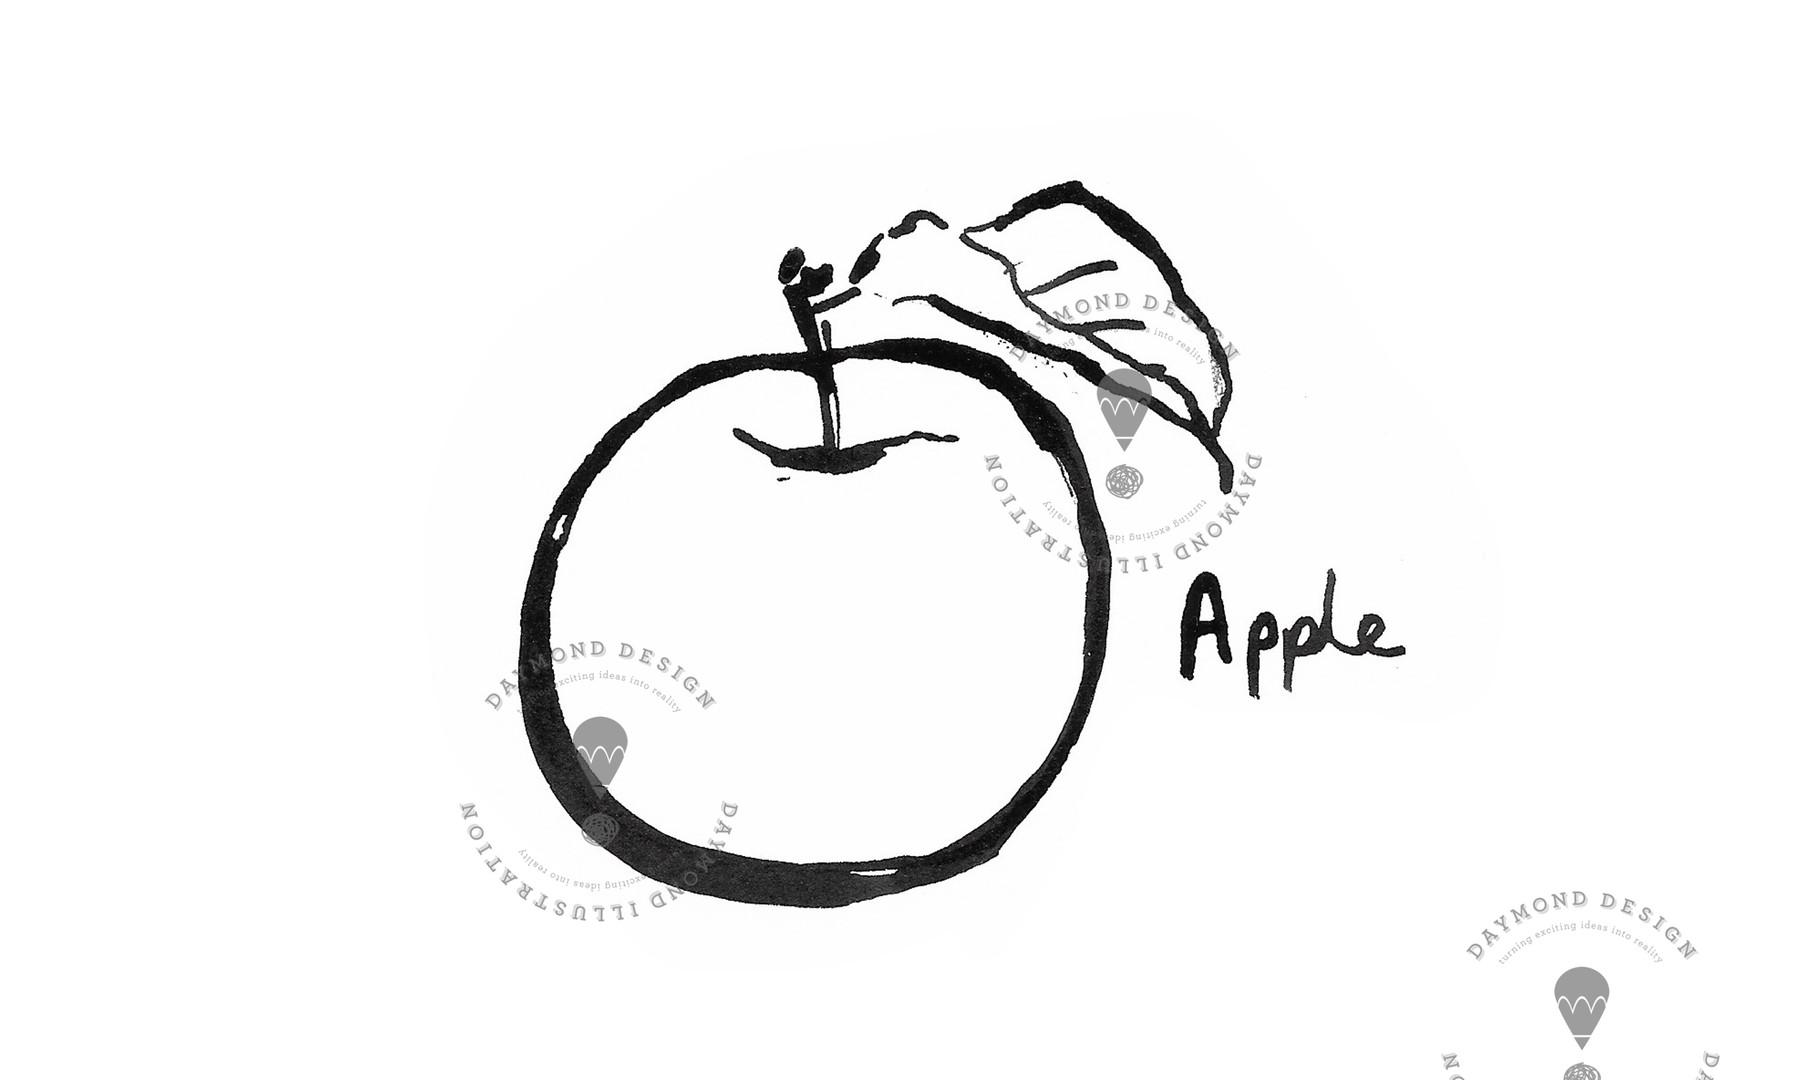 apple fruit brush ink B&W food illustration by Jenny Daymond Design and illustration